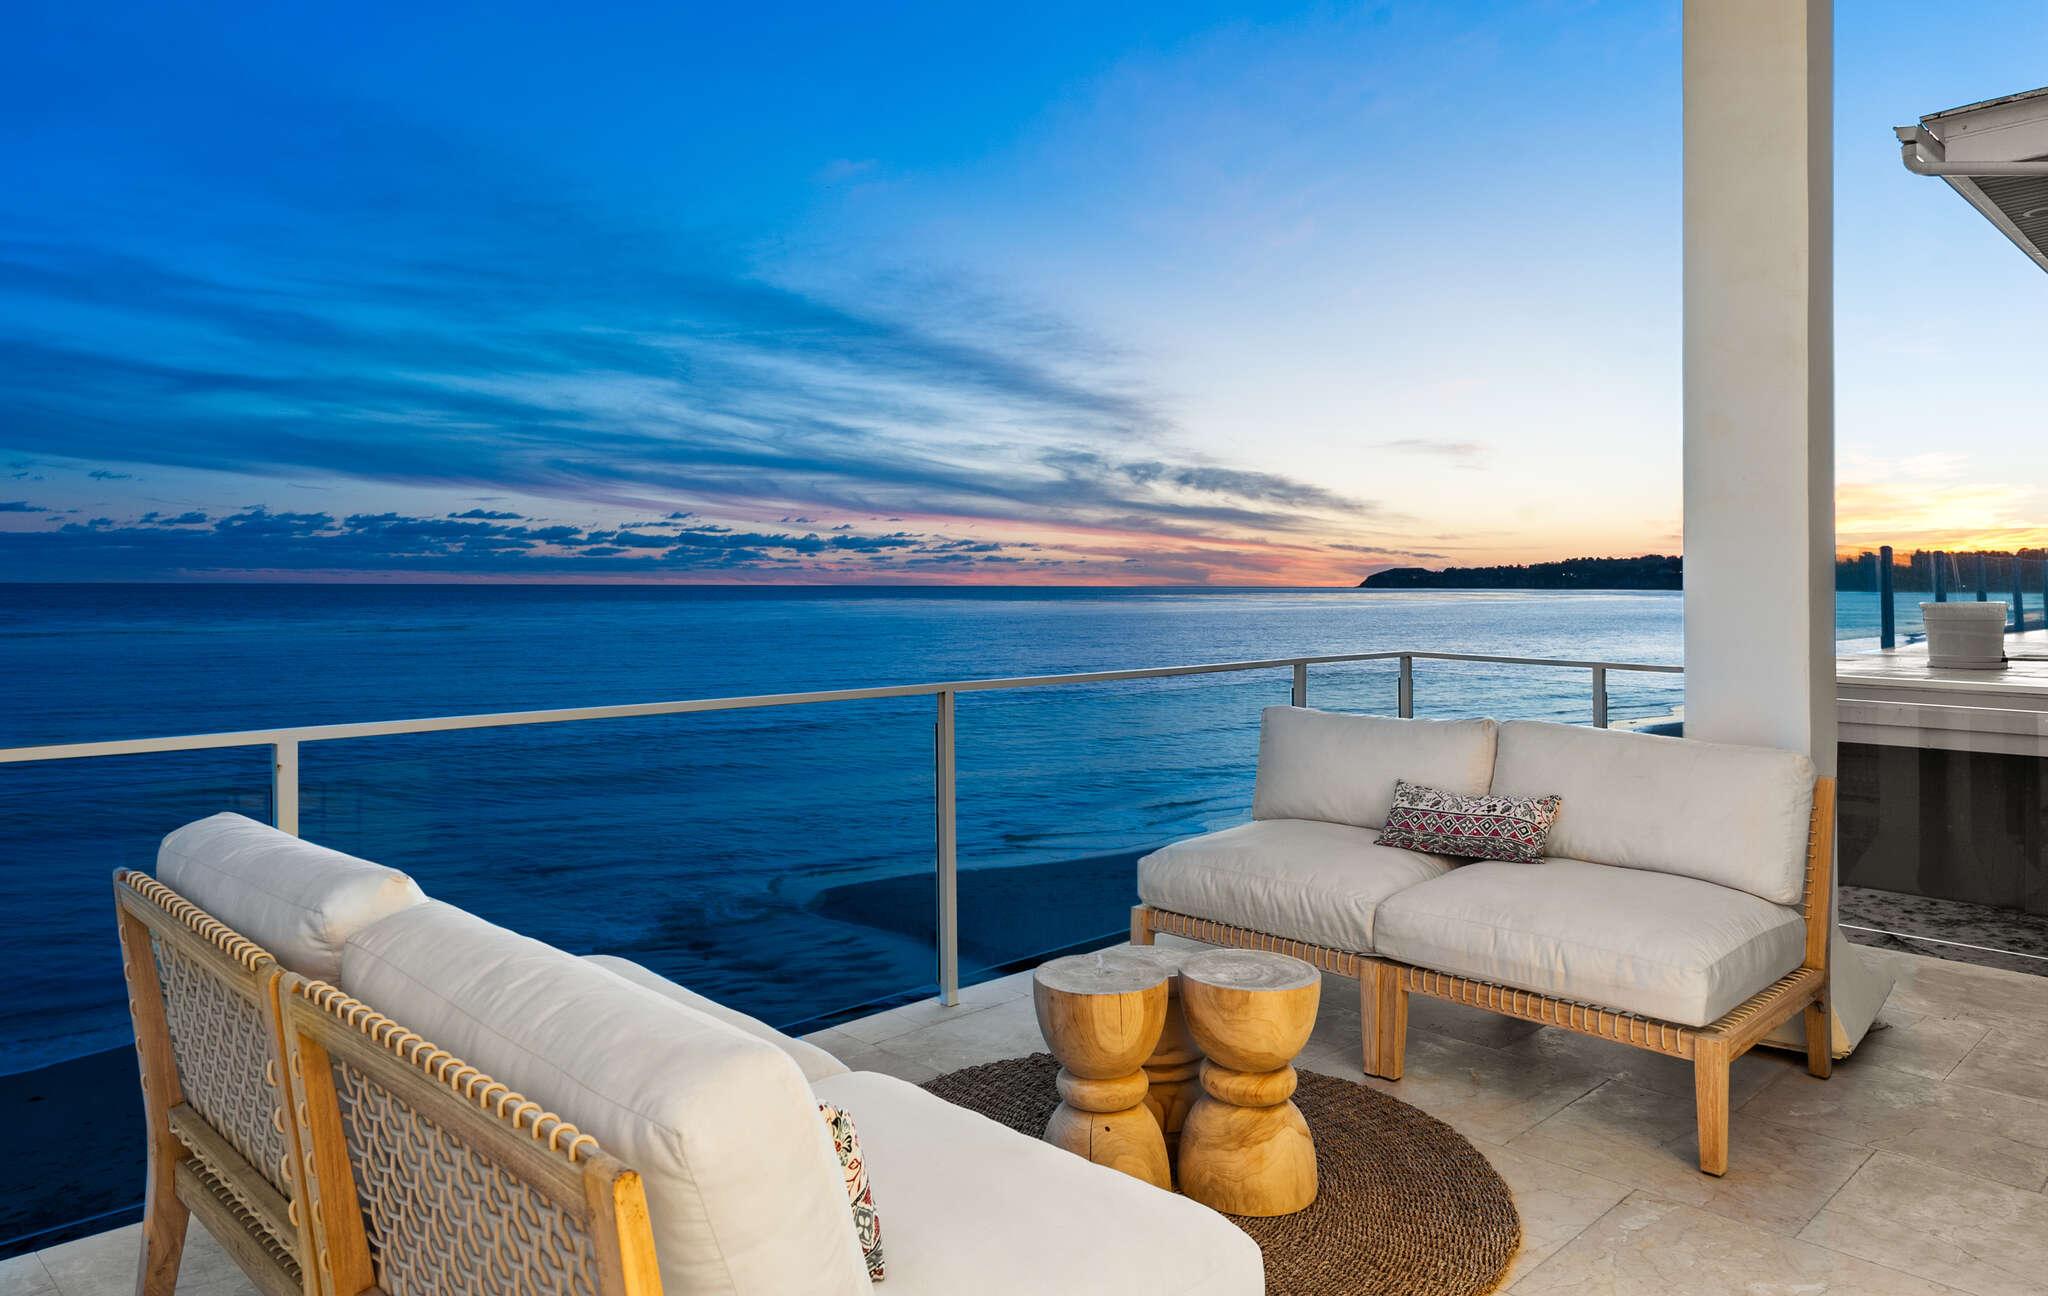 Single Family for Sale at 27140 Malibu Cove Colony Drive Malibu, California 90265 United States